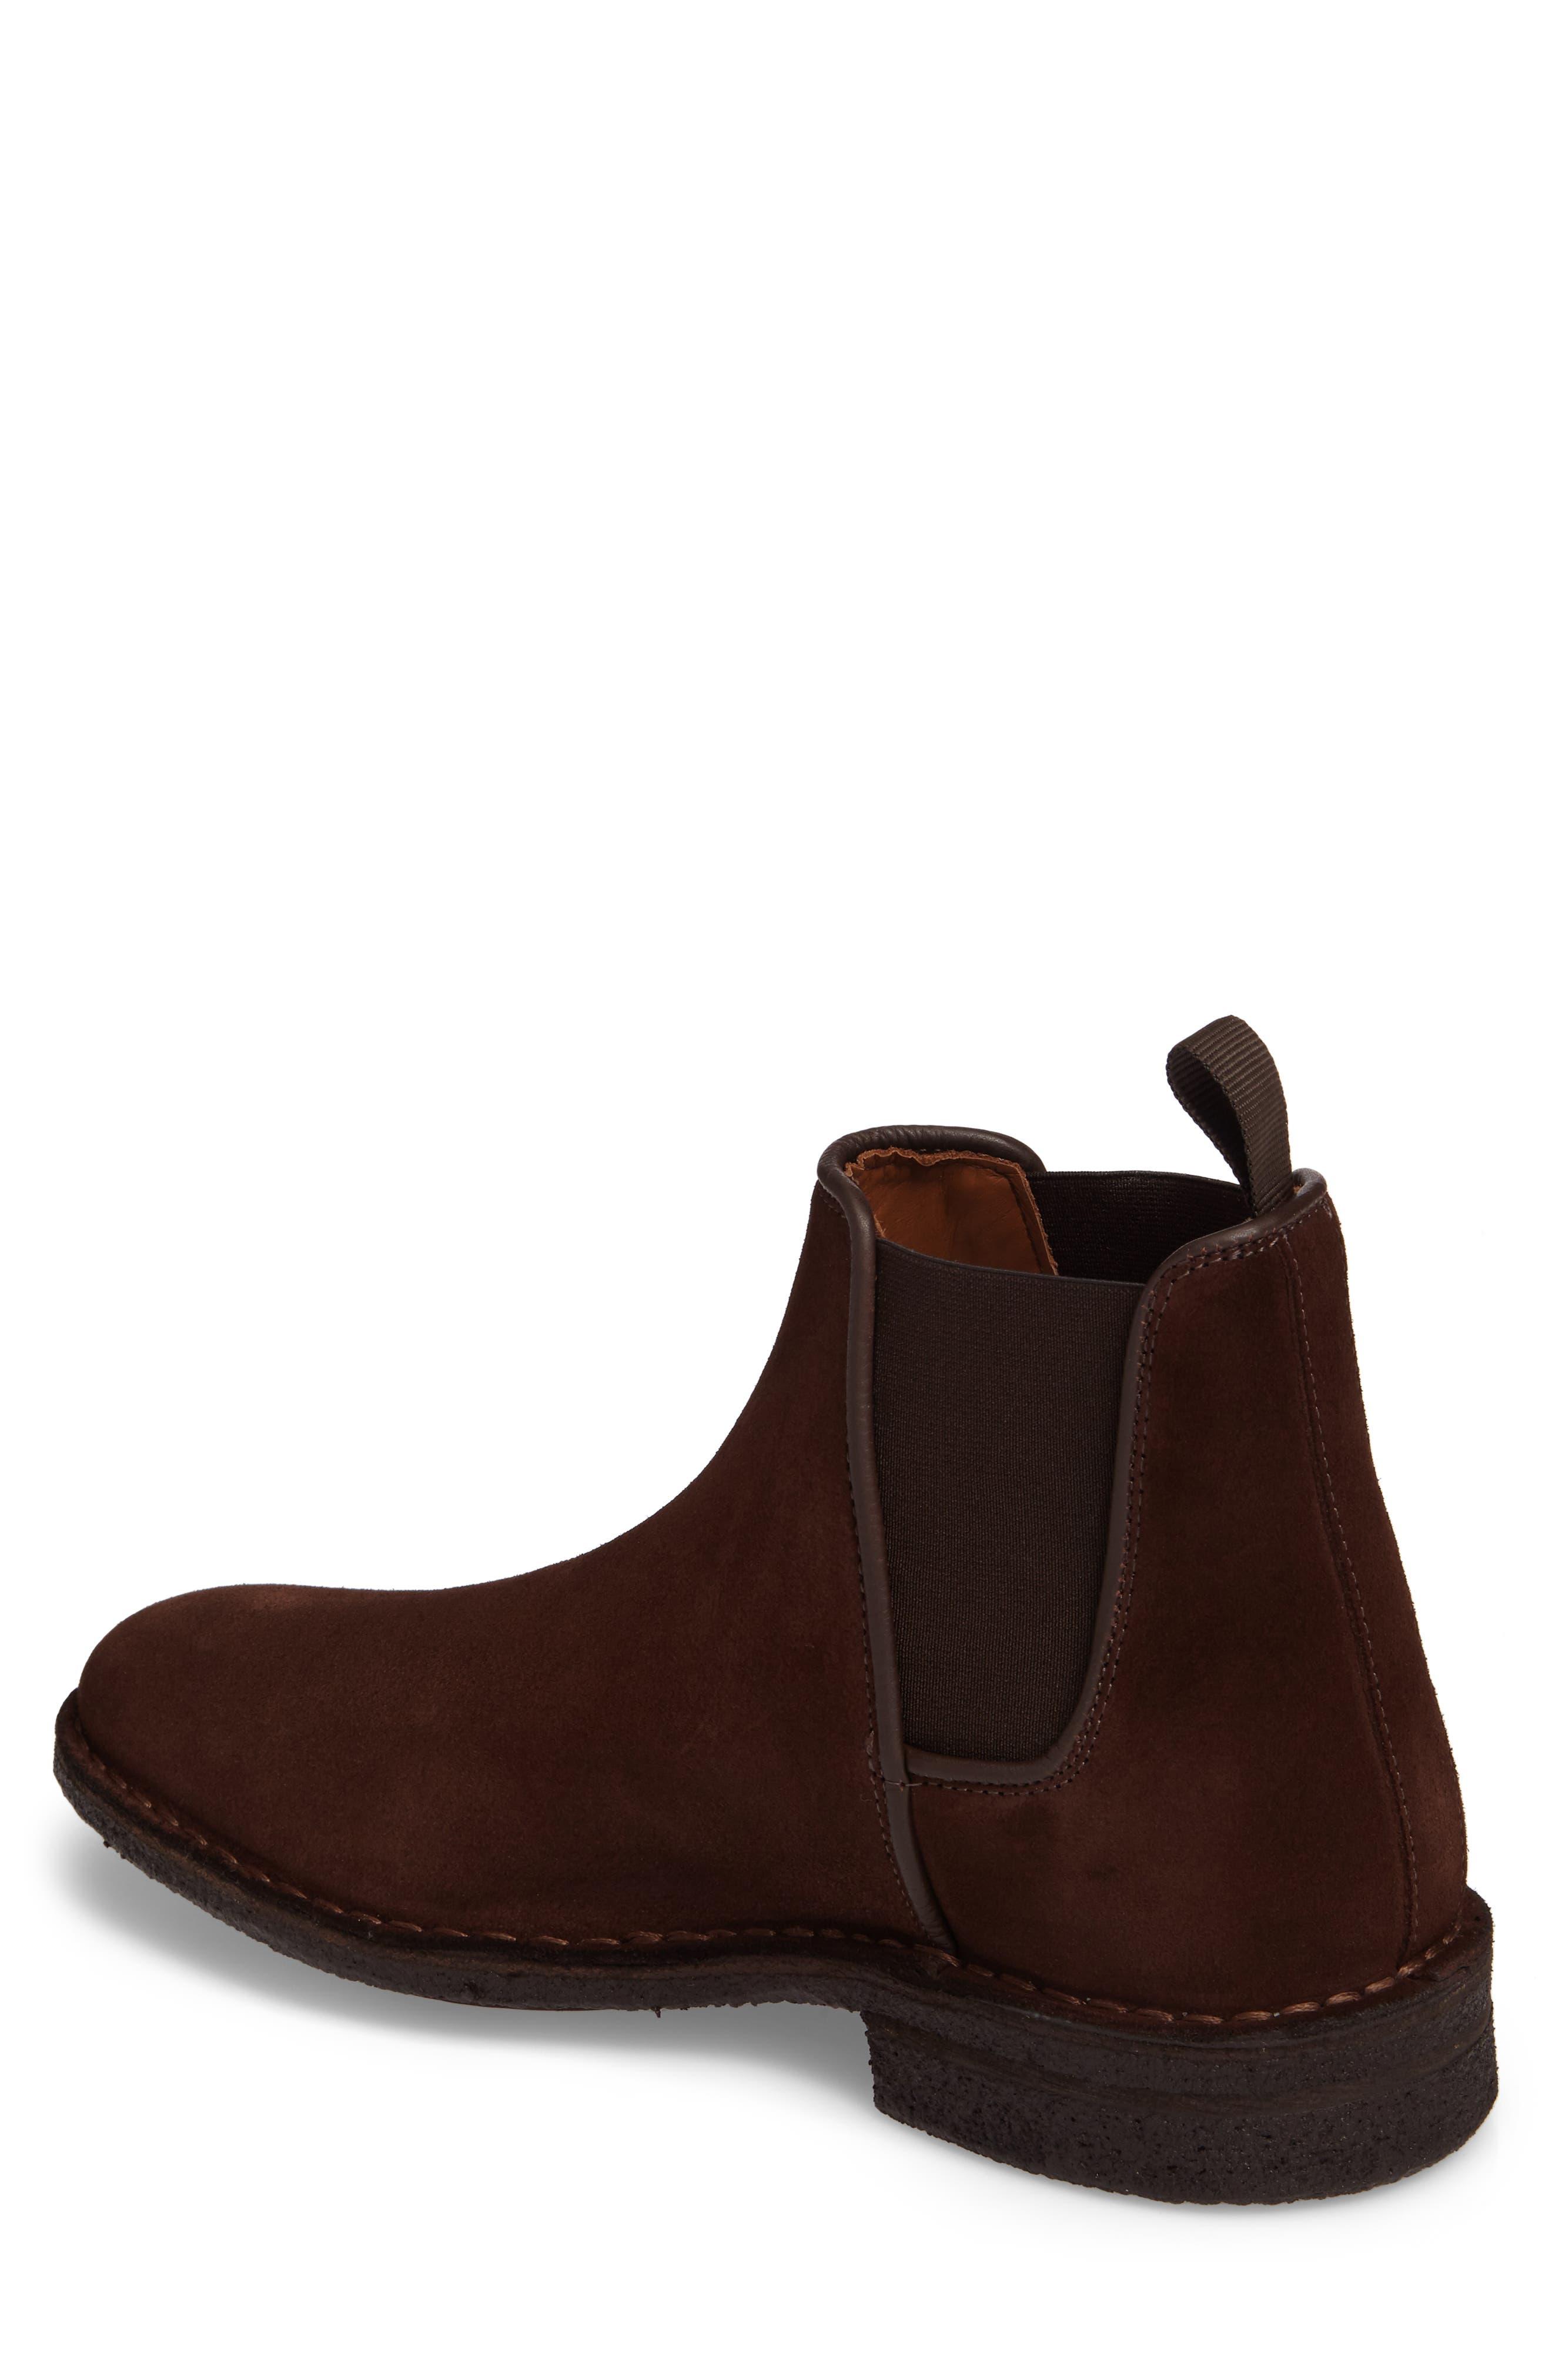 Oscar Chelsea Boot,                             Alternate thumbnail 2, color,                             Medium Brown